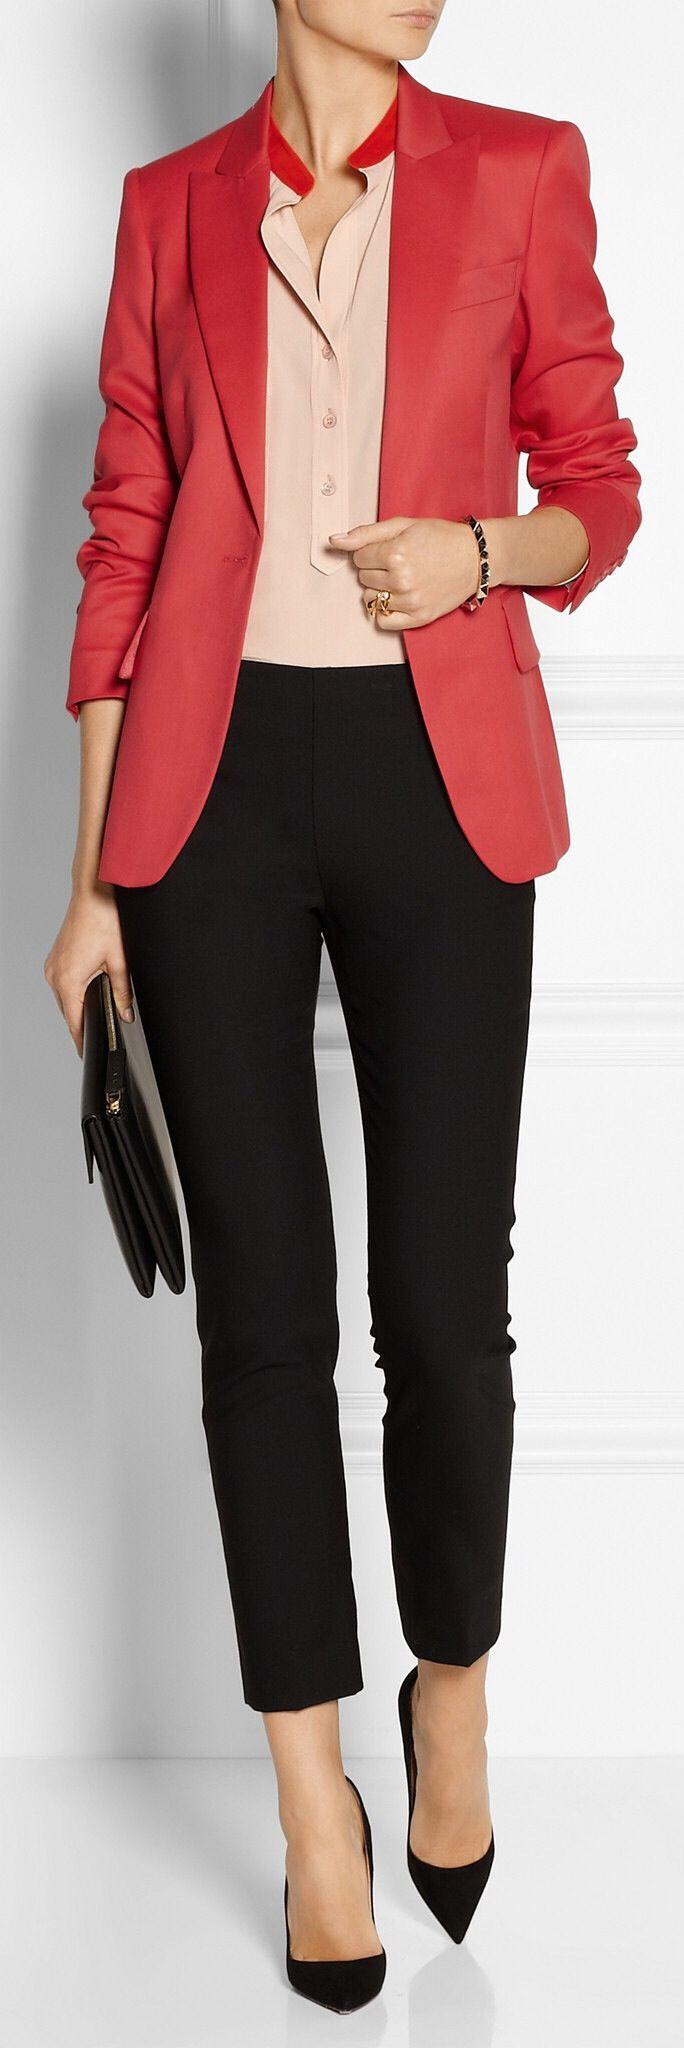 Stella McCartney      http://sulia.com/channel/fashion/f/8a2f1377-1ab6-417b-b2d8-7c88059c7e7c/?source=pin&action=share&btn=small&form_factor=desktop&pinner=125430493